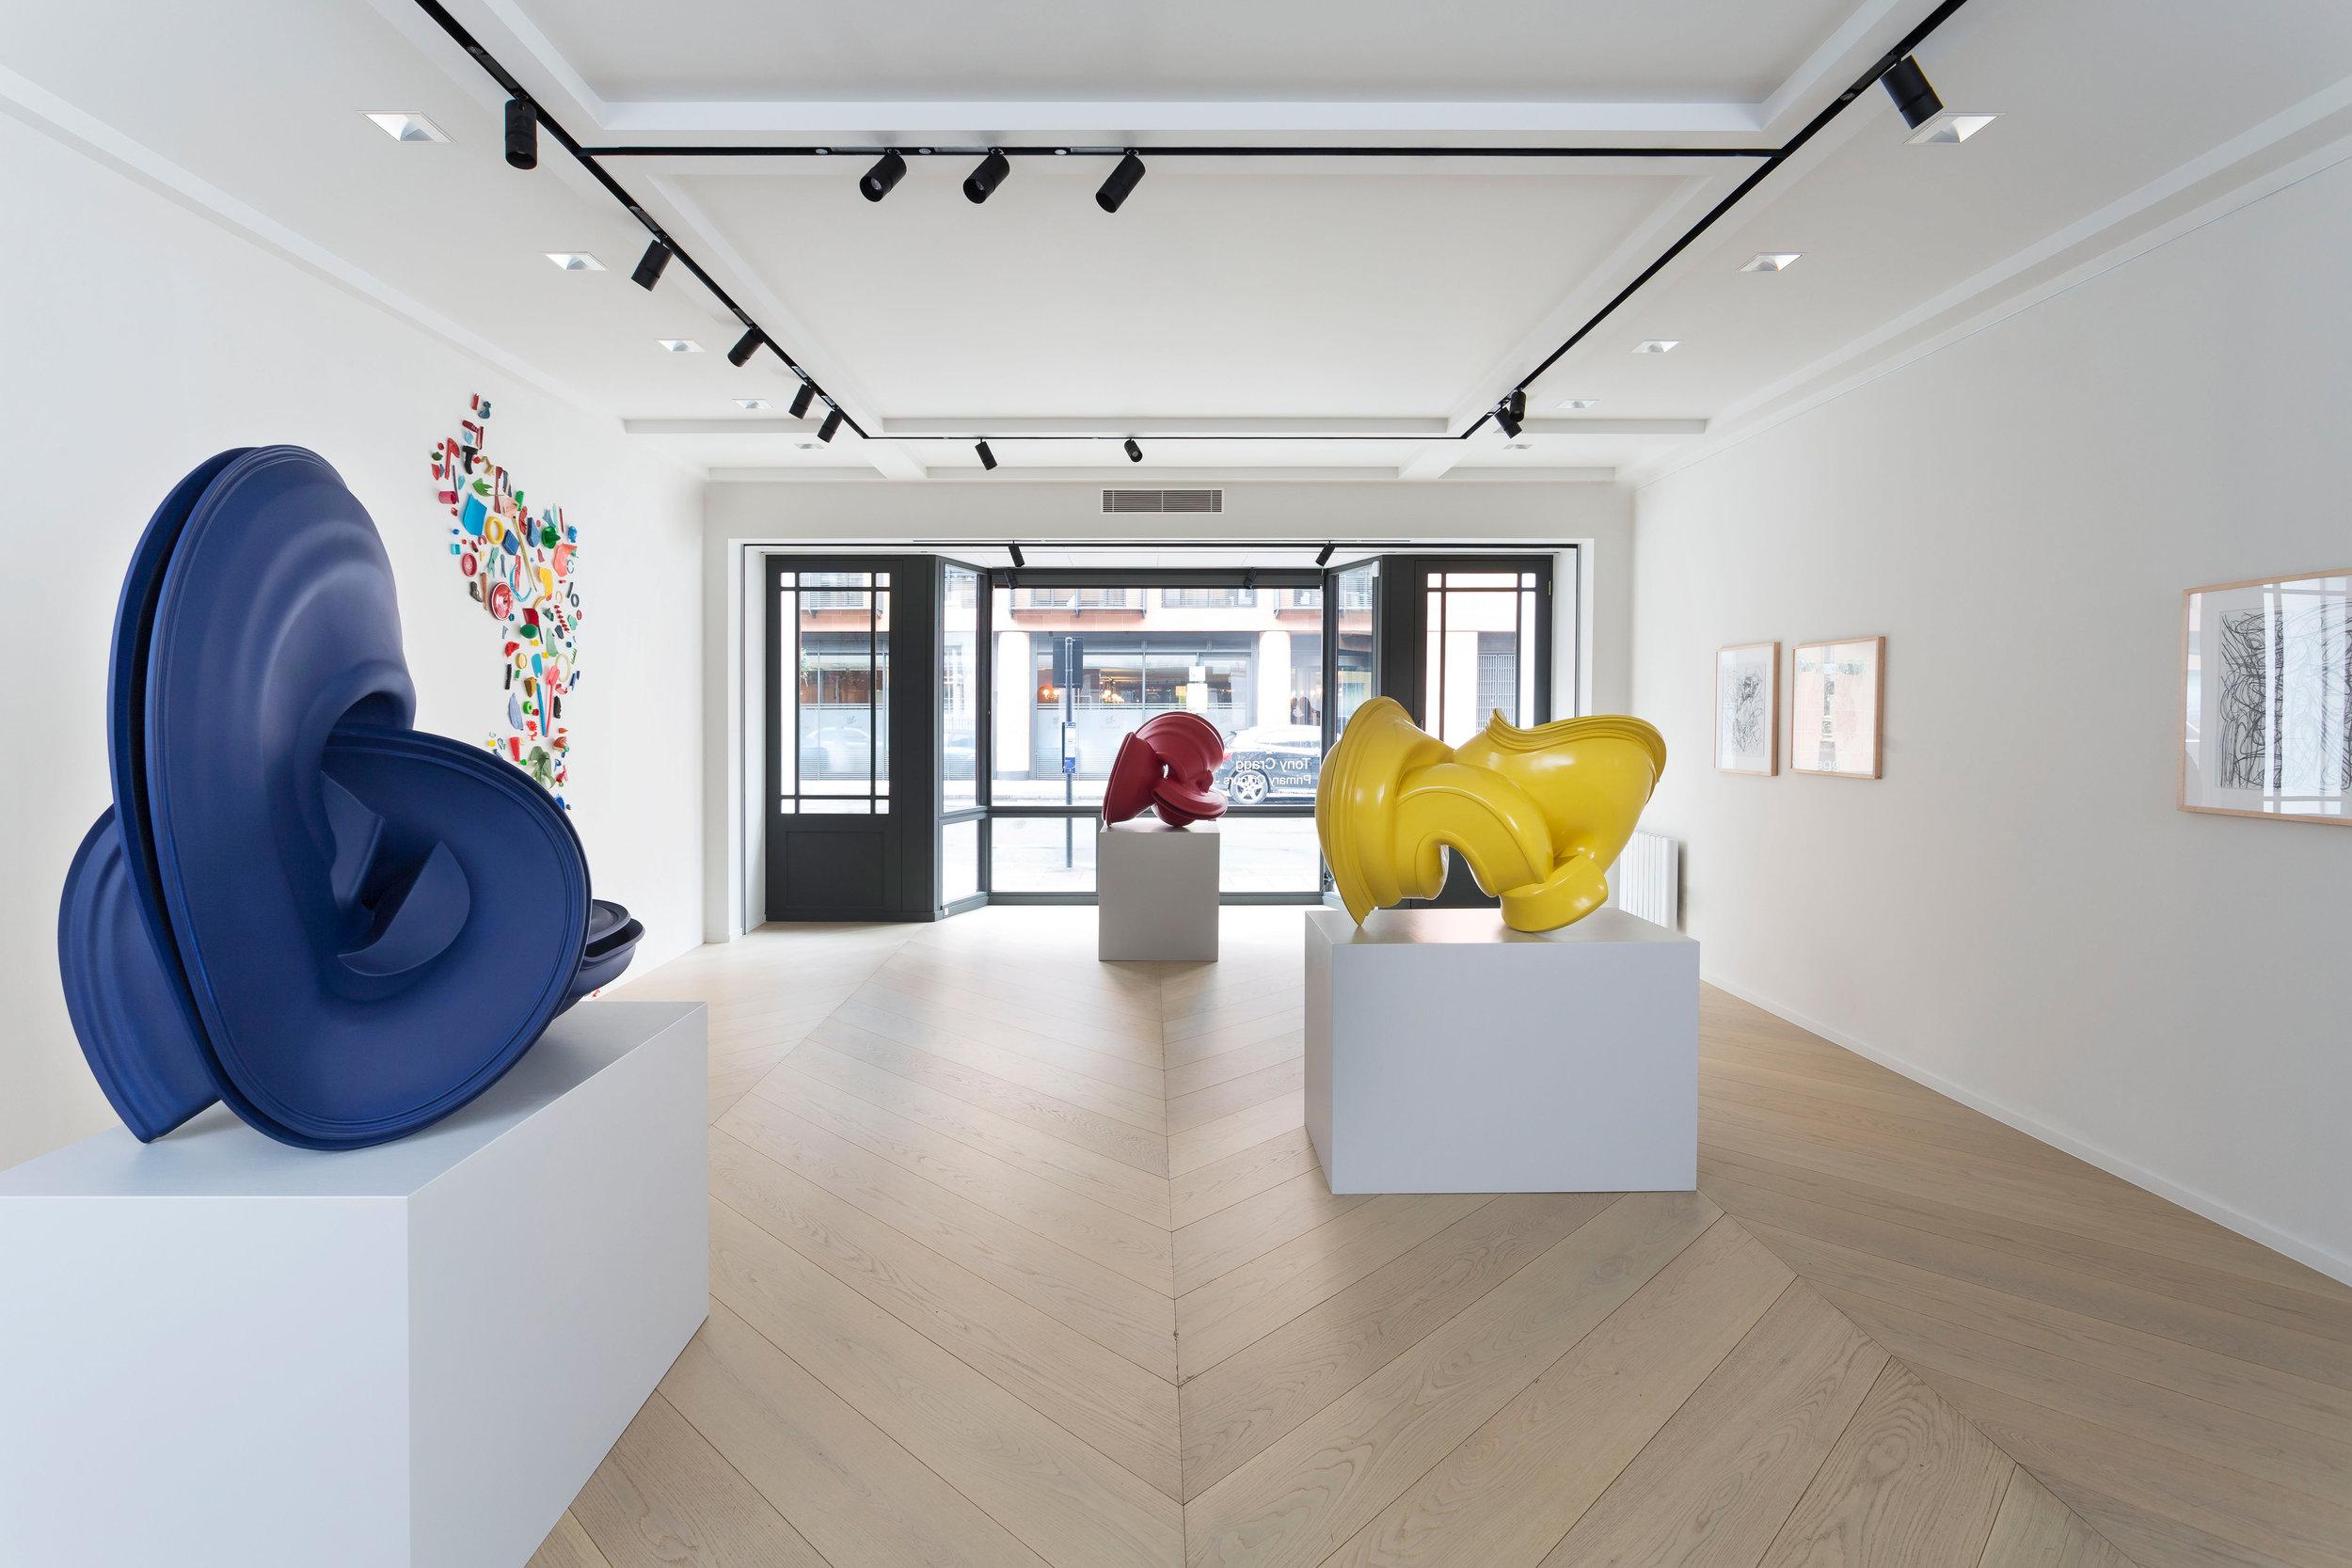 Tony Cragg - Primary Colours Exhibition 2017.jpg